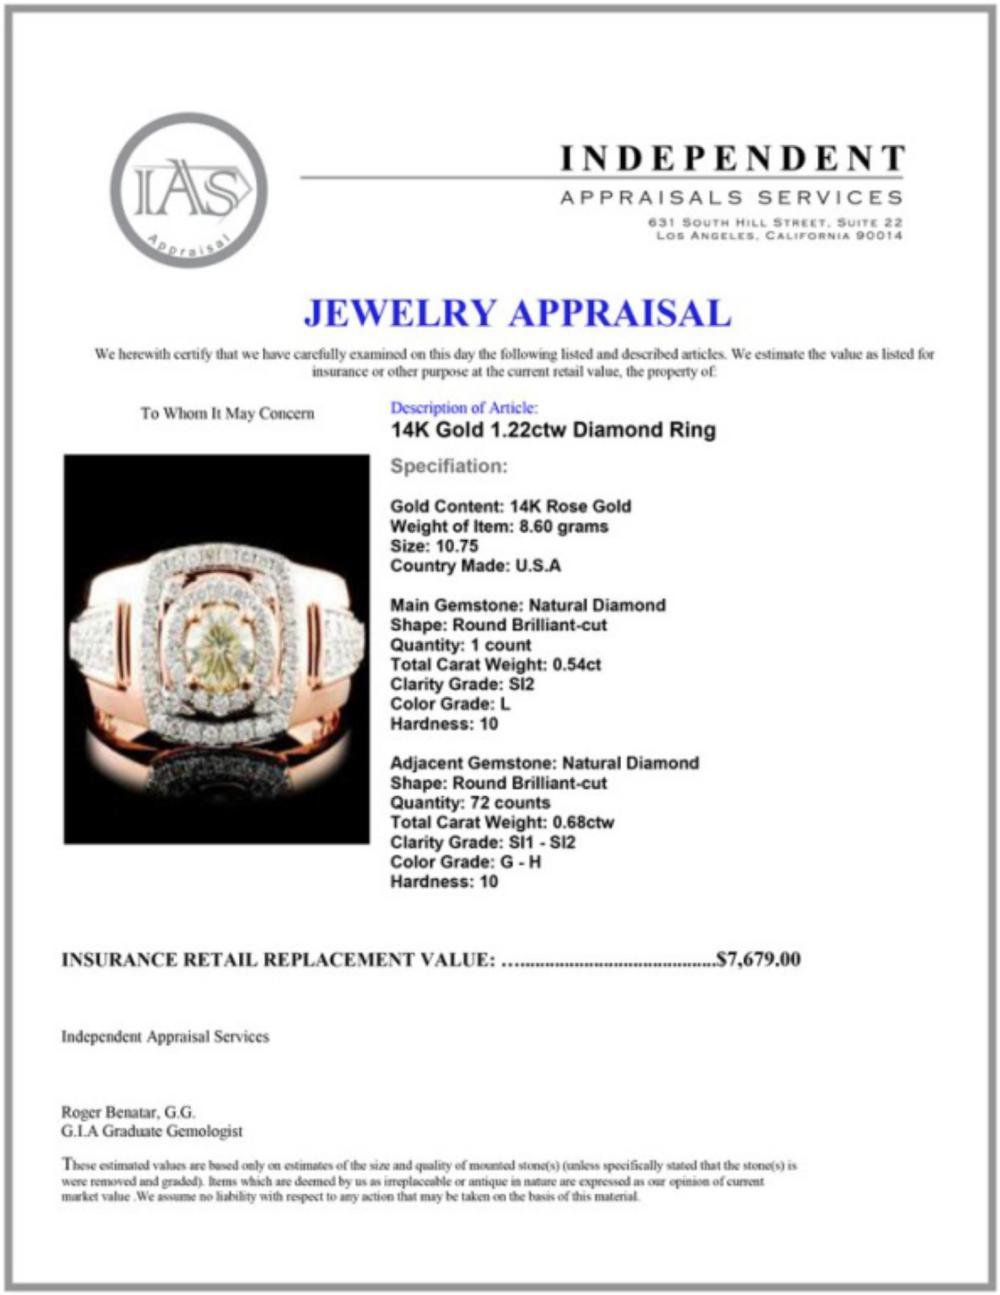 Lot 140: 14K Gold 1.22ctw Diamond Ring